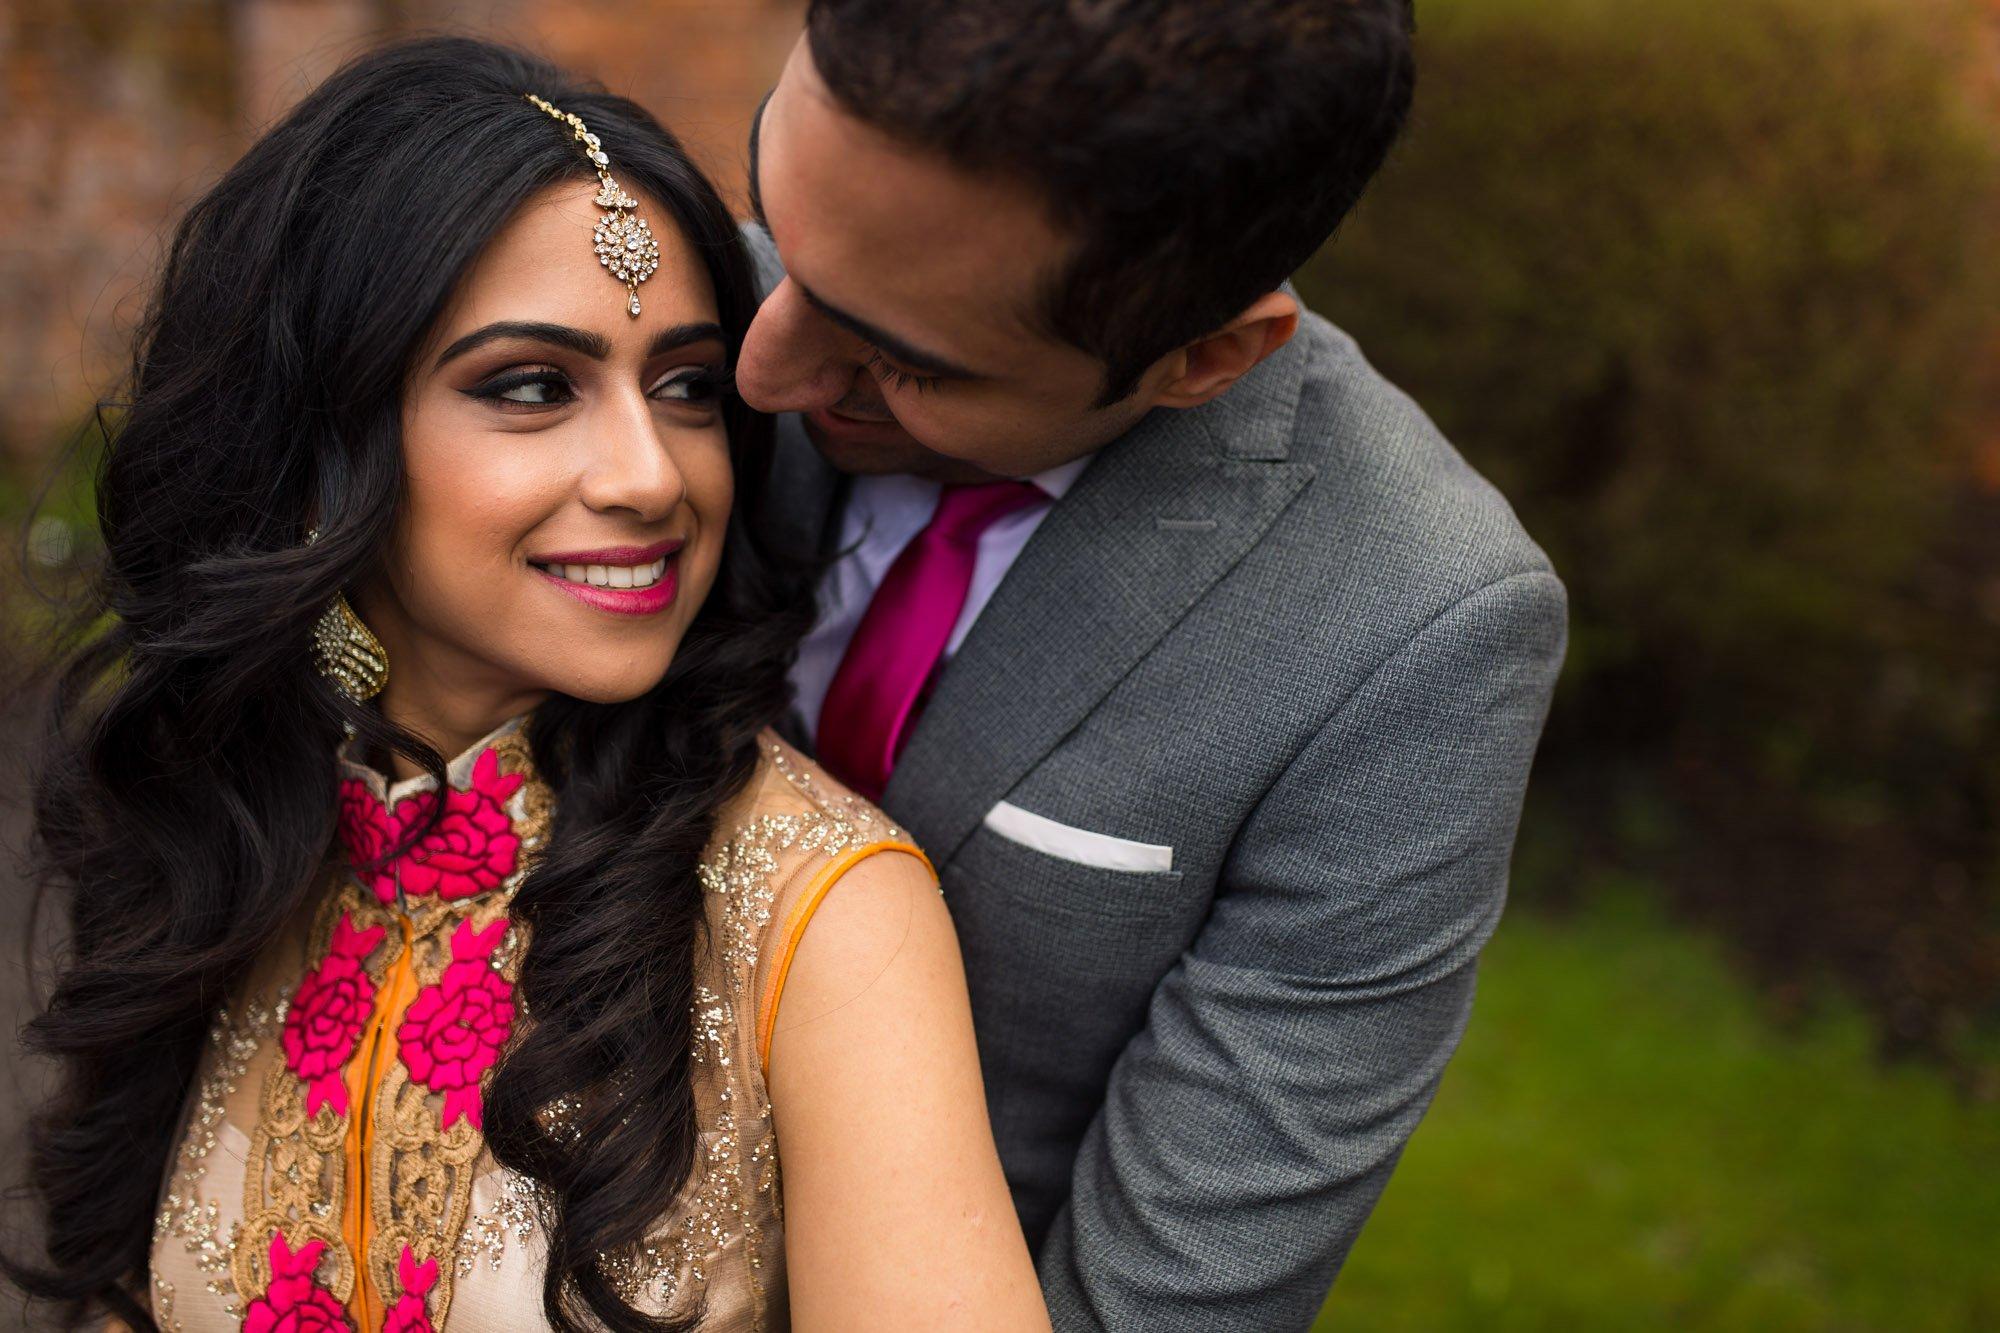 Baylis House, Berkshire, Sikh wedding photographer London, Roka ceremony